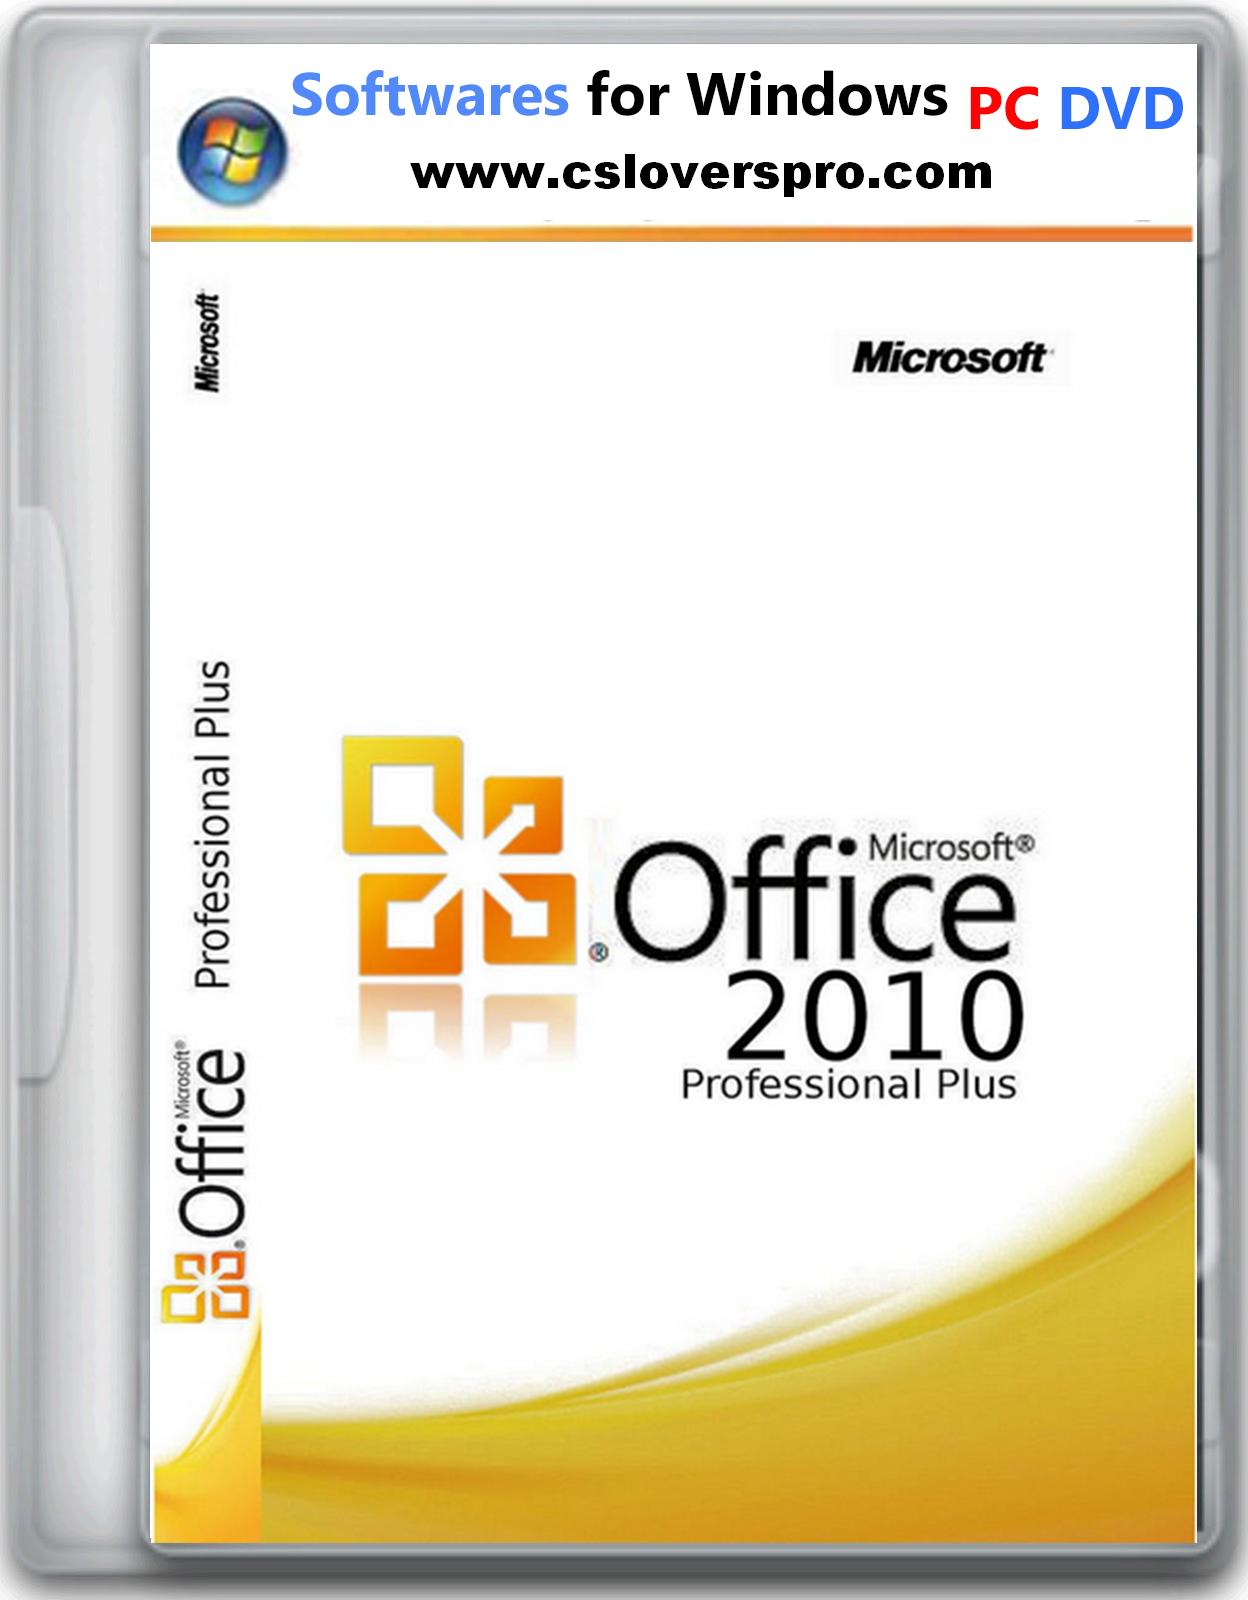 microsoft office 2010 professional plus free download full version